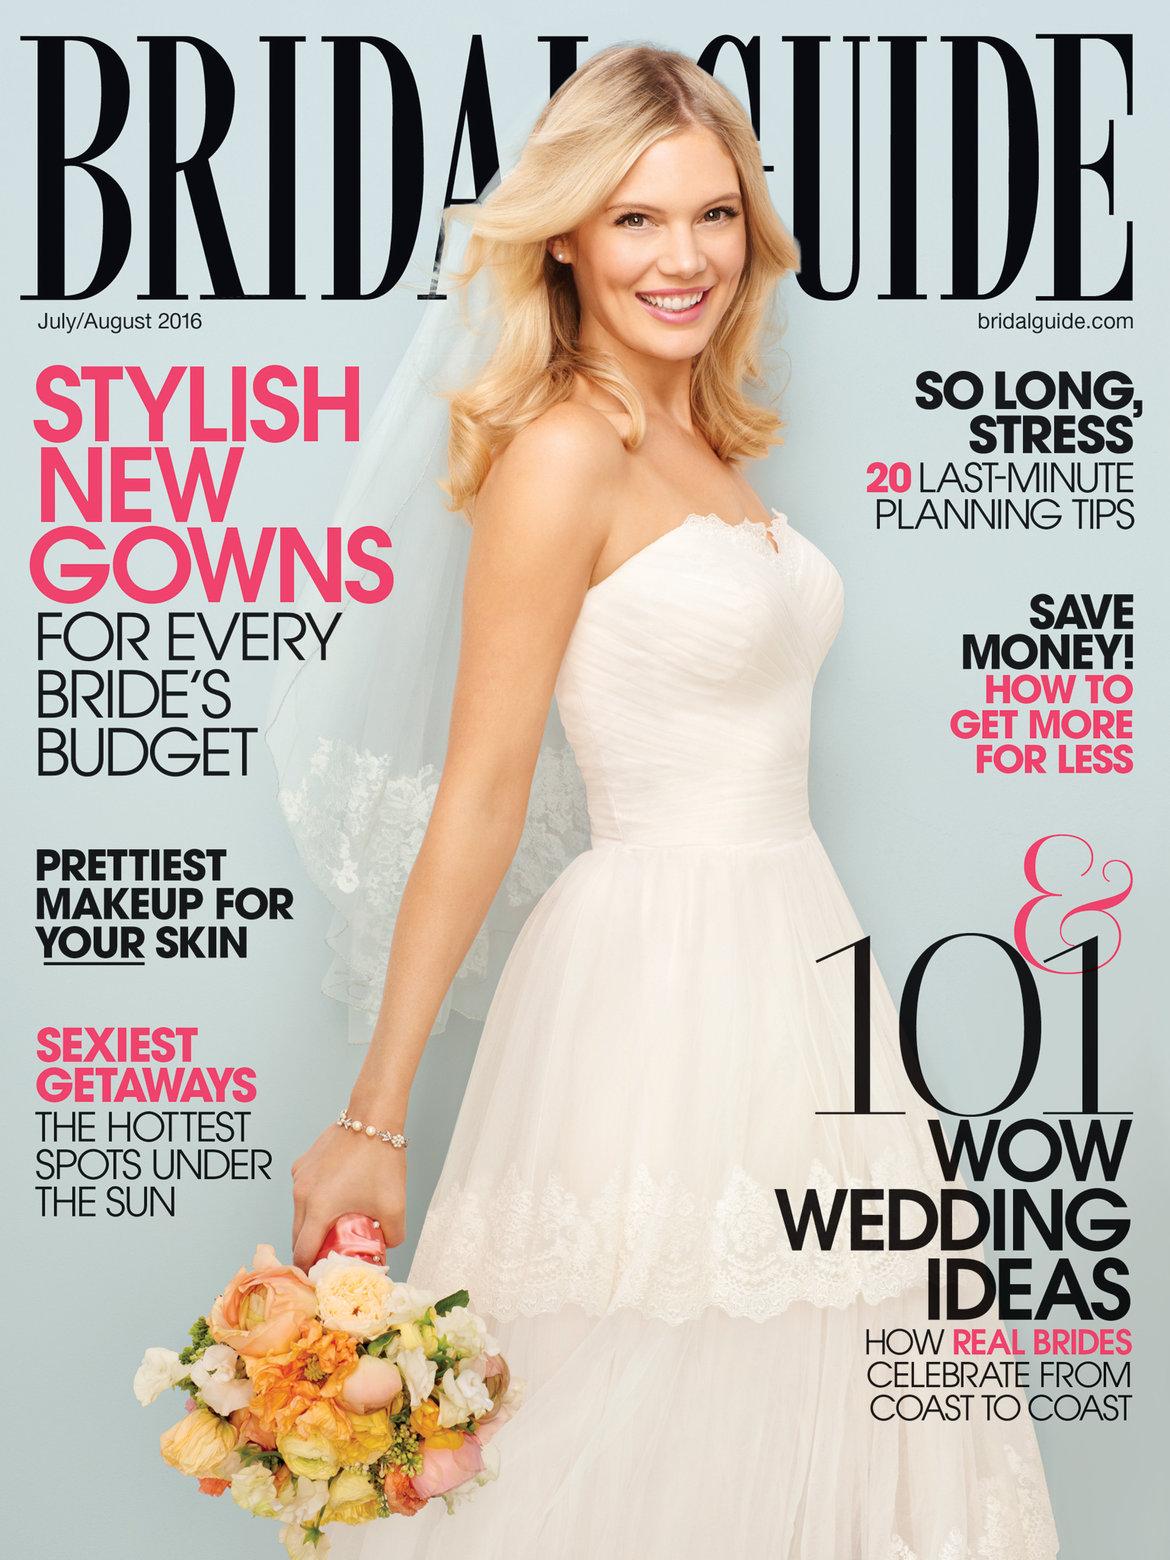 Bridal Guide Jul/Aug 2016